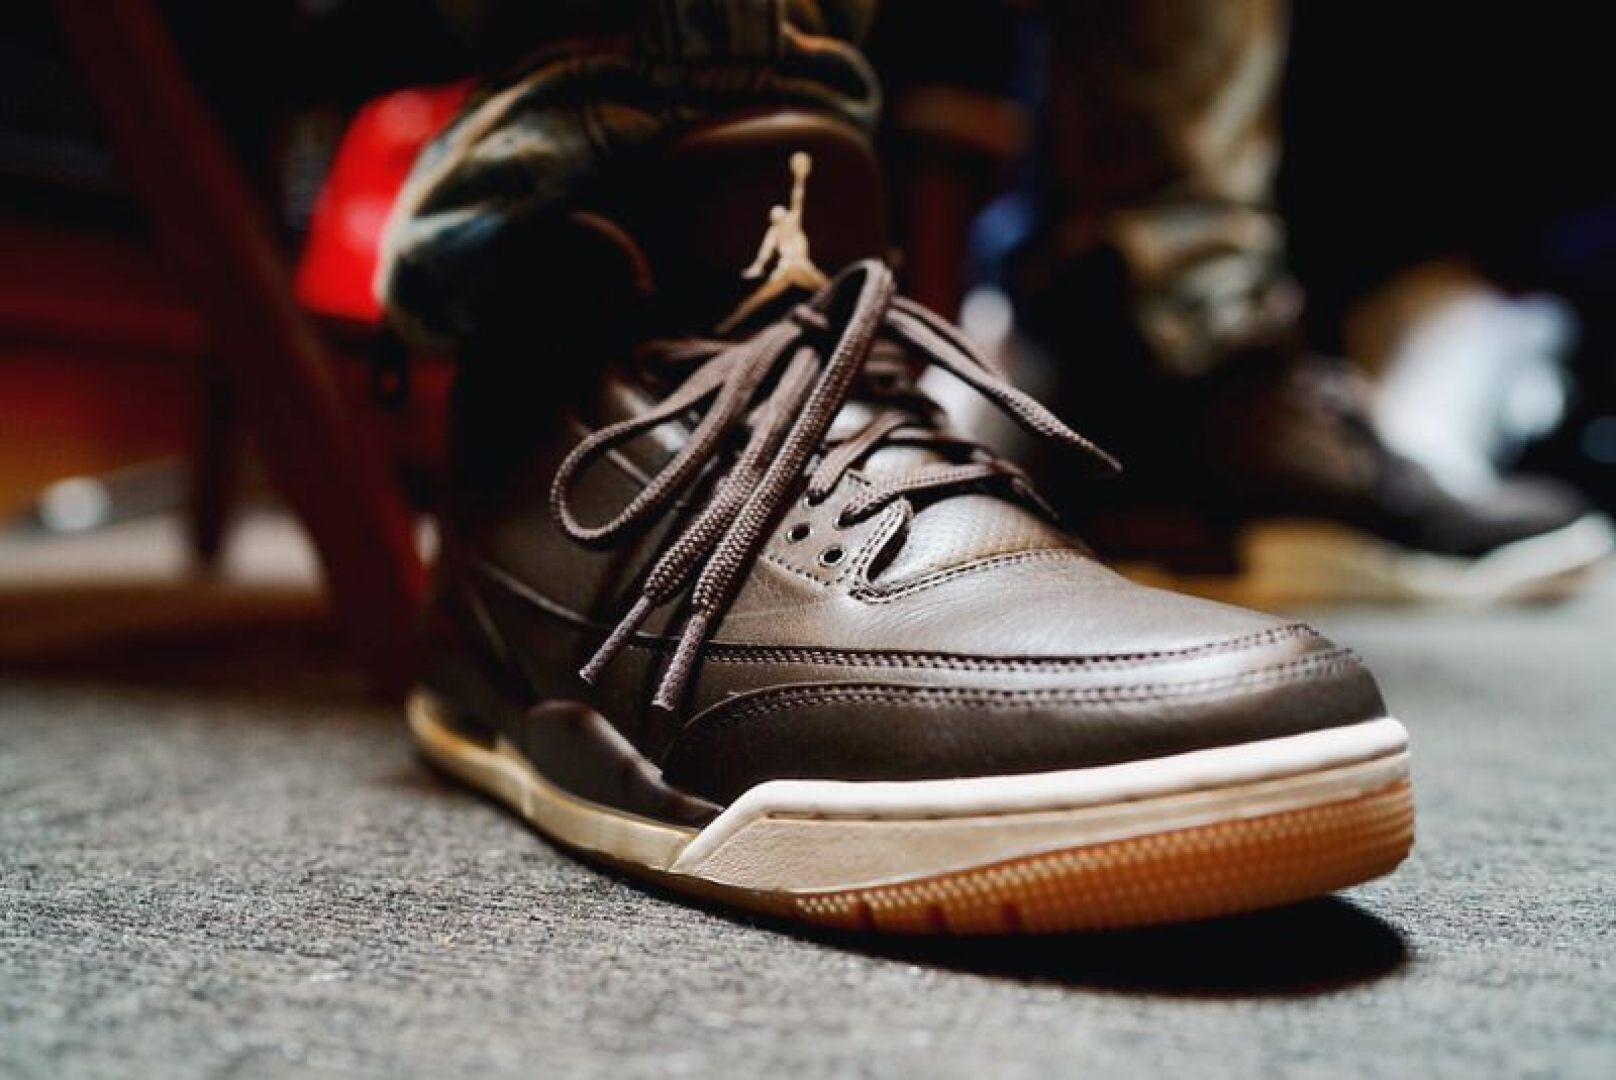 Air Jordan 3 Brown/Gum for Anthony Hamilton